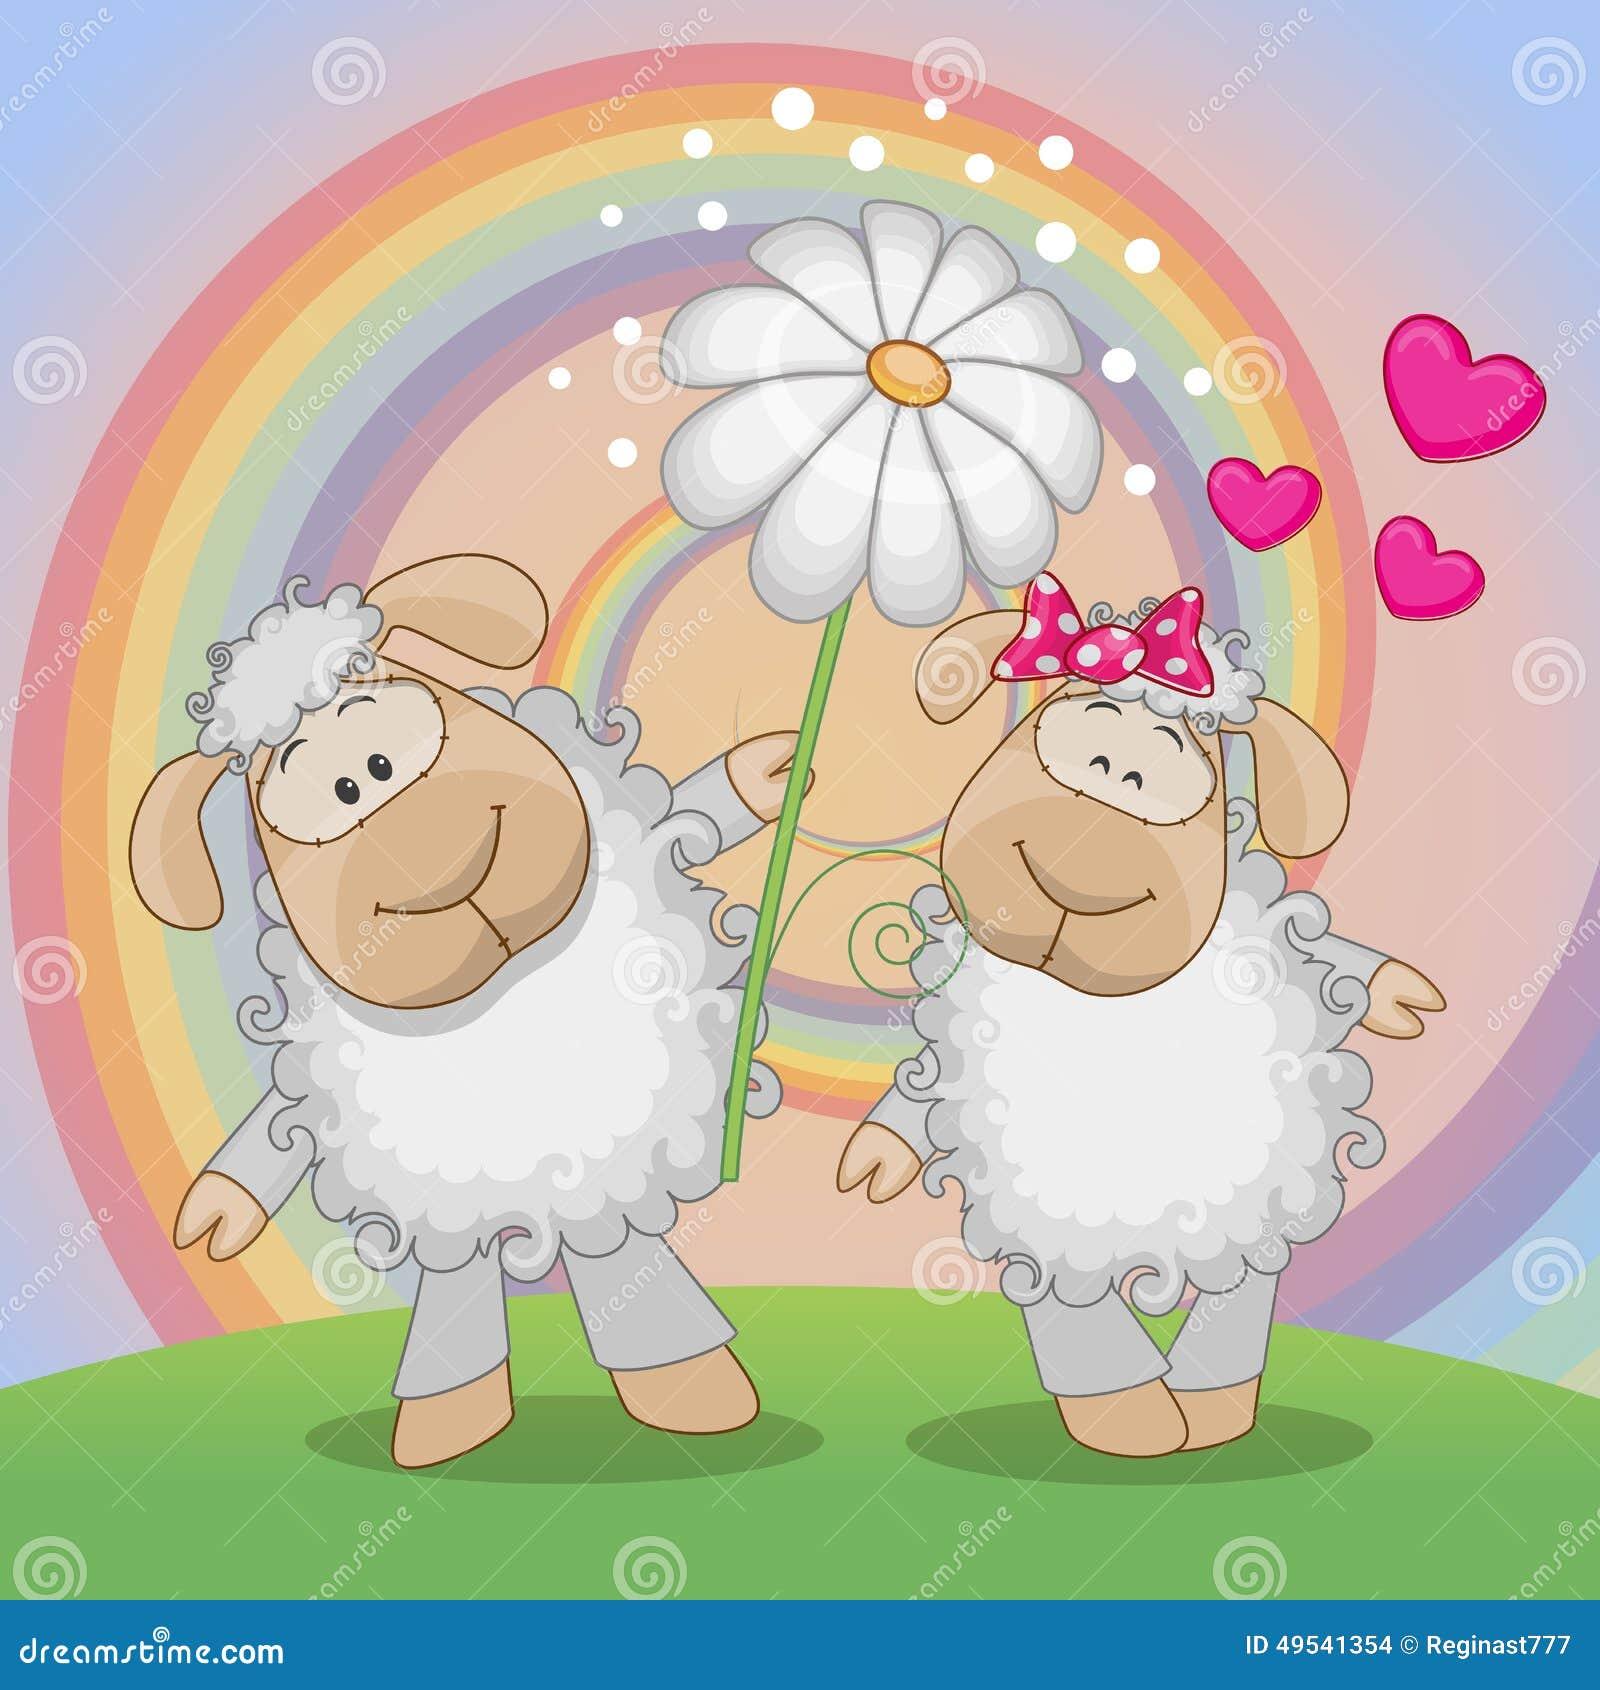 Two Sheep Royalty-Free Stock Image | CartoonDealer.com #156382